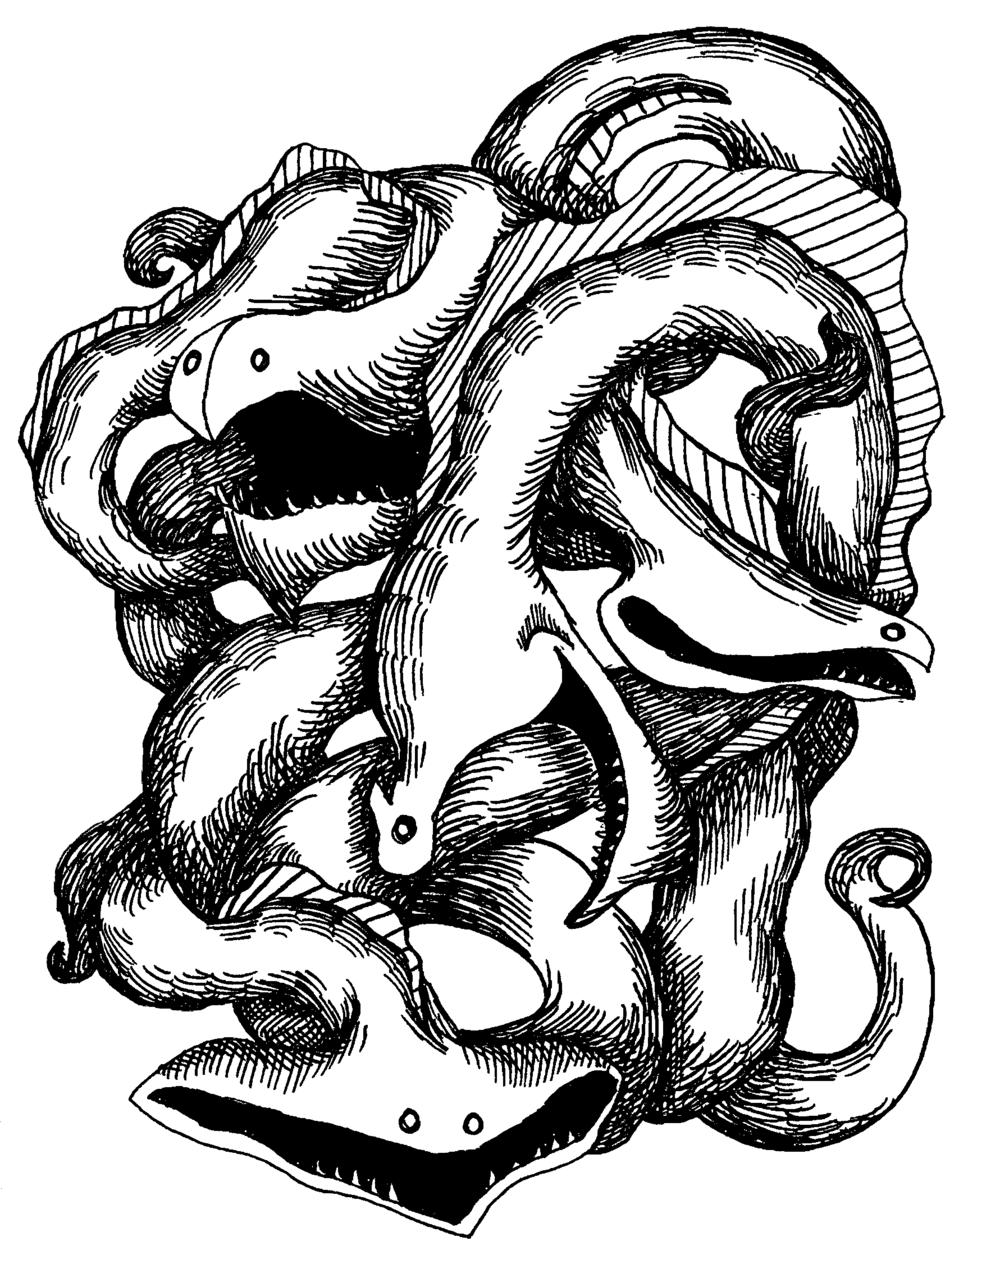 Gulper Eels